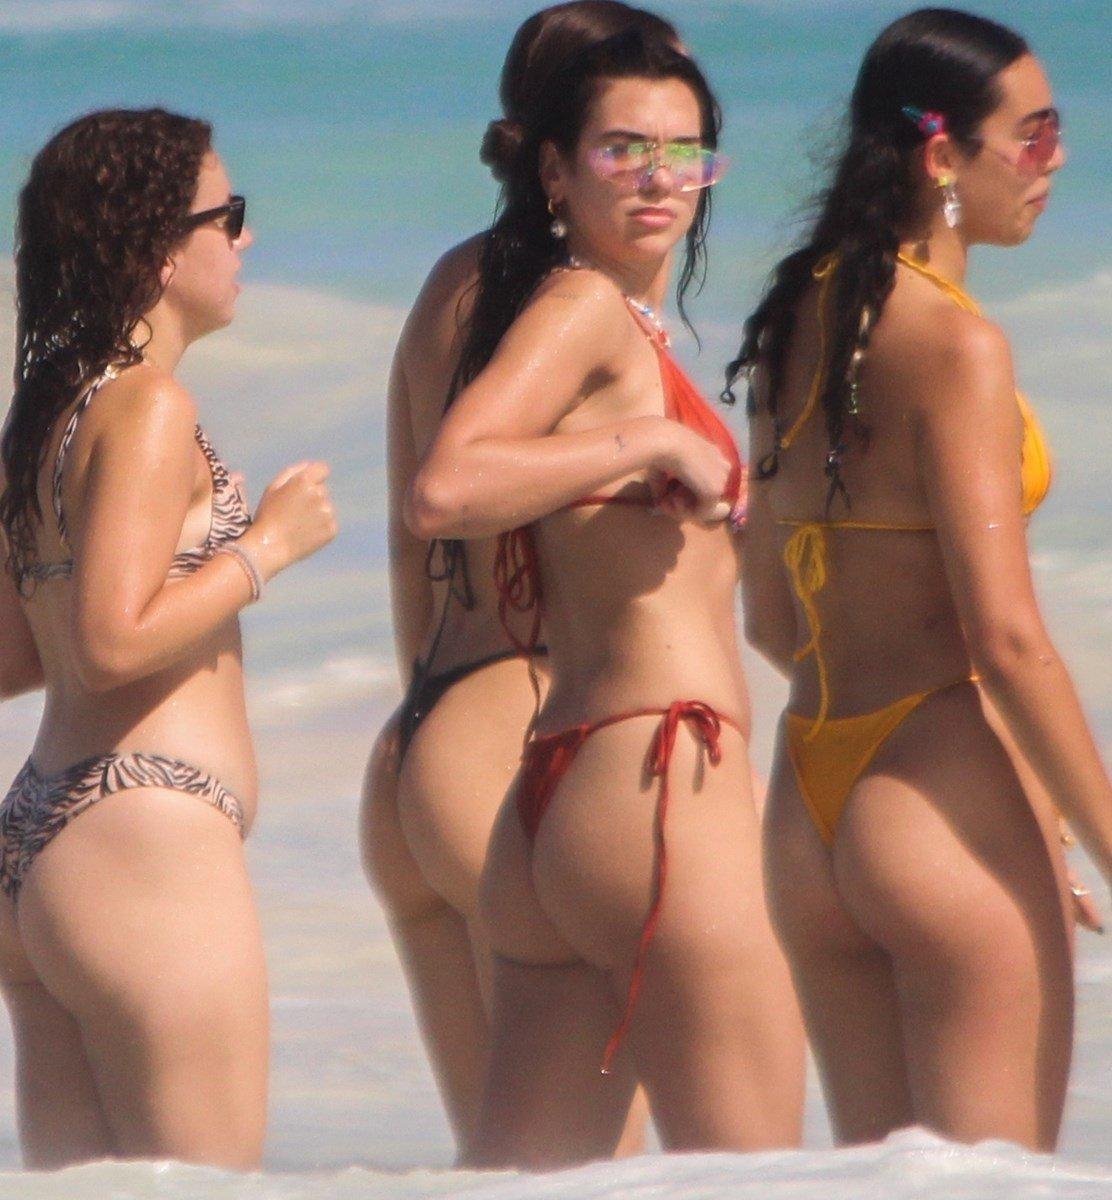 Dua Lipa Nude Pageant Headshot And Ass Thong Bikini Pics